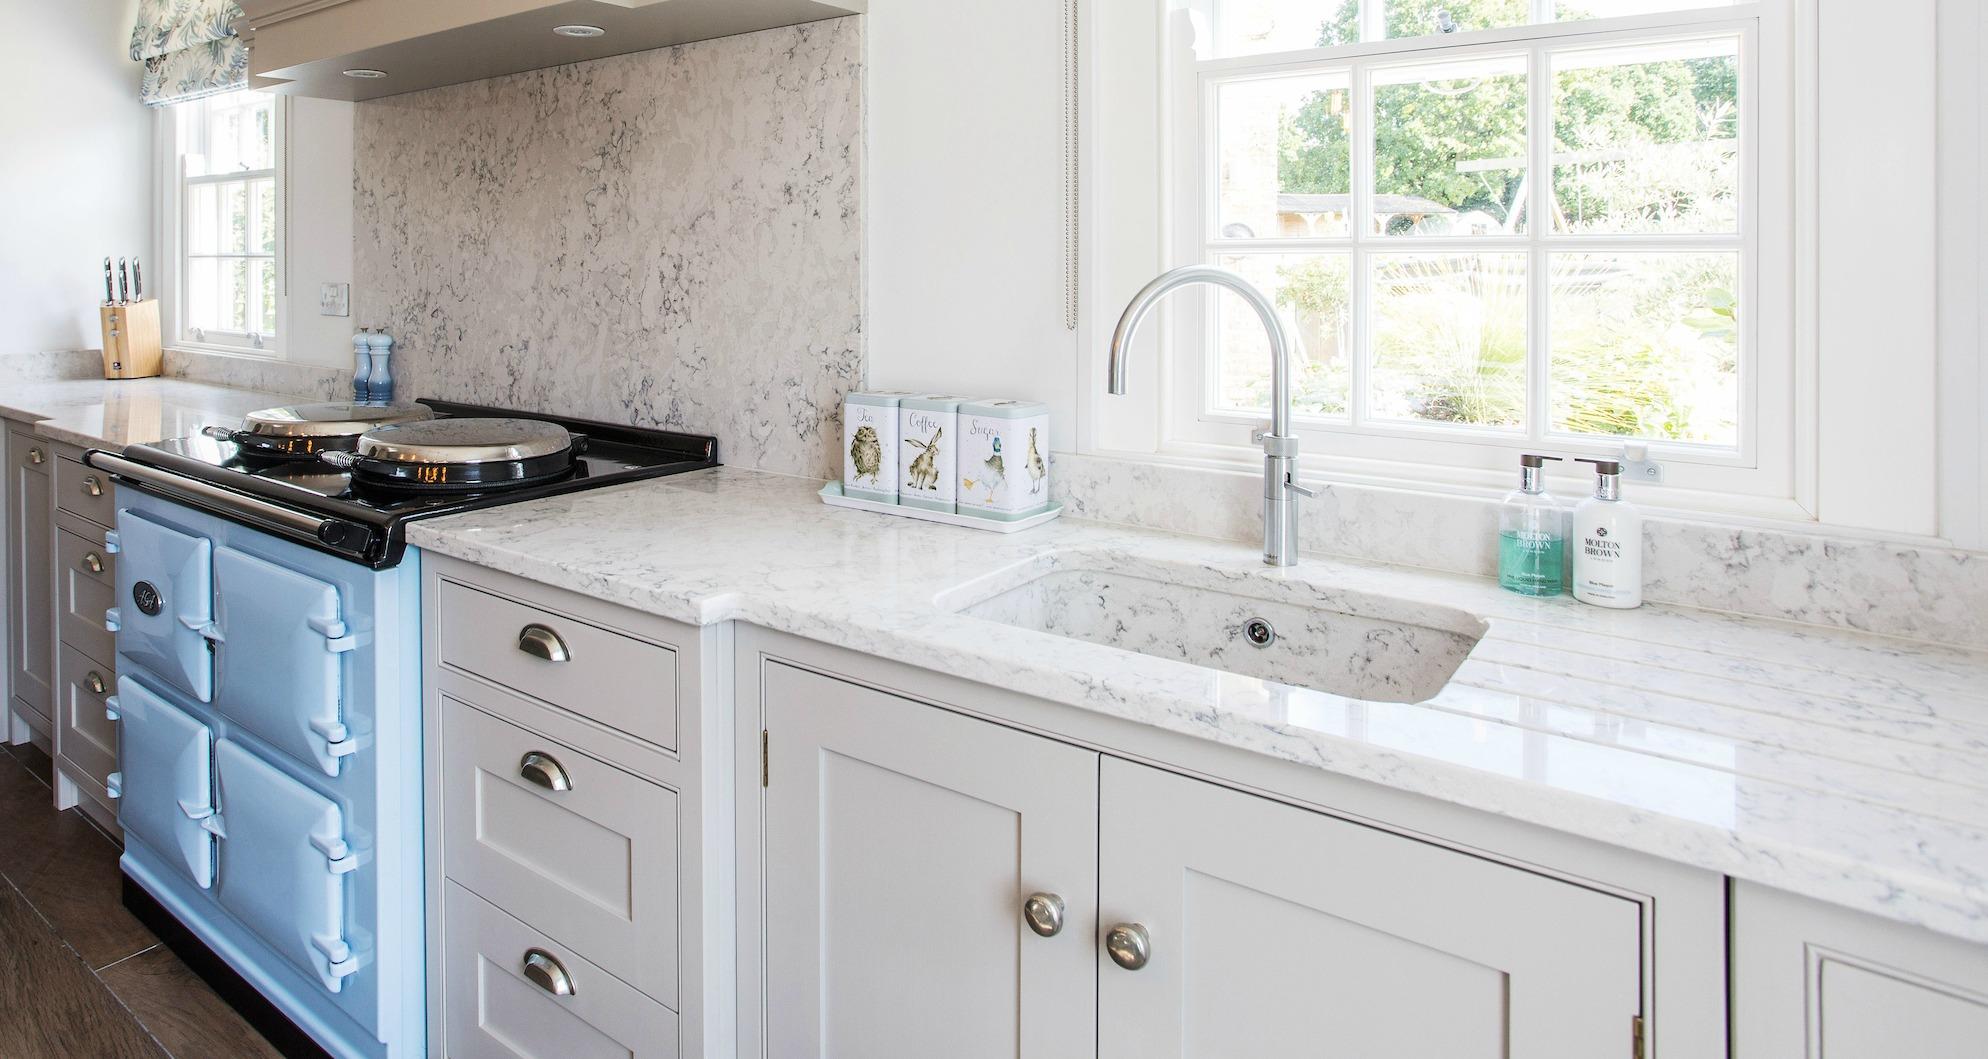 Country style kitchen sink best with bathr galley kitchen for Country style galley kitchens